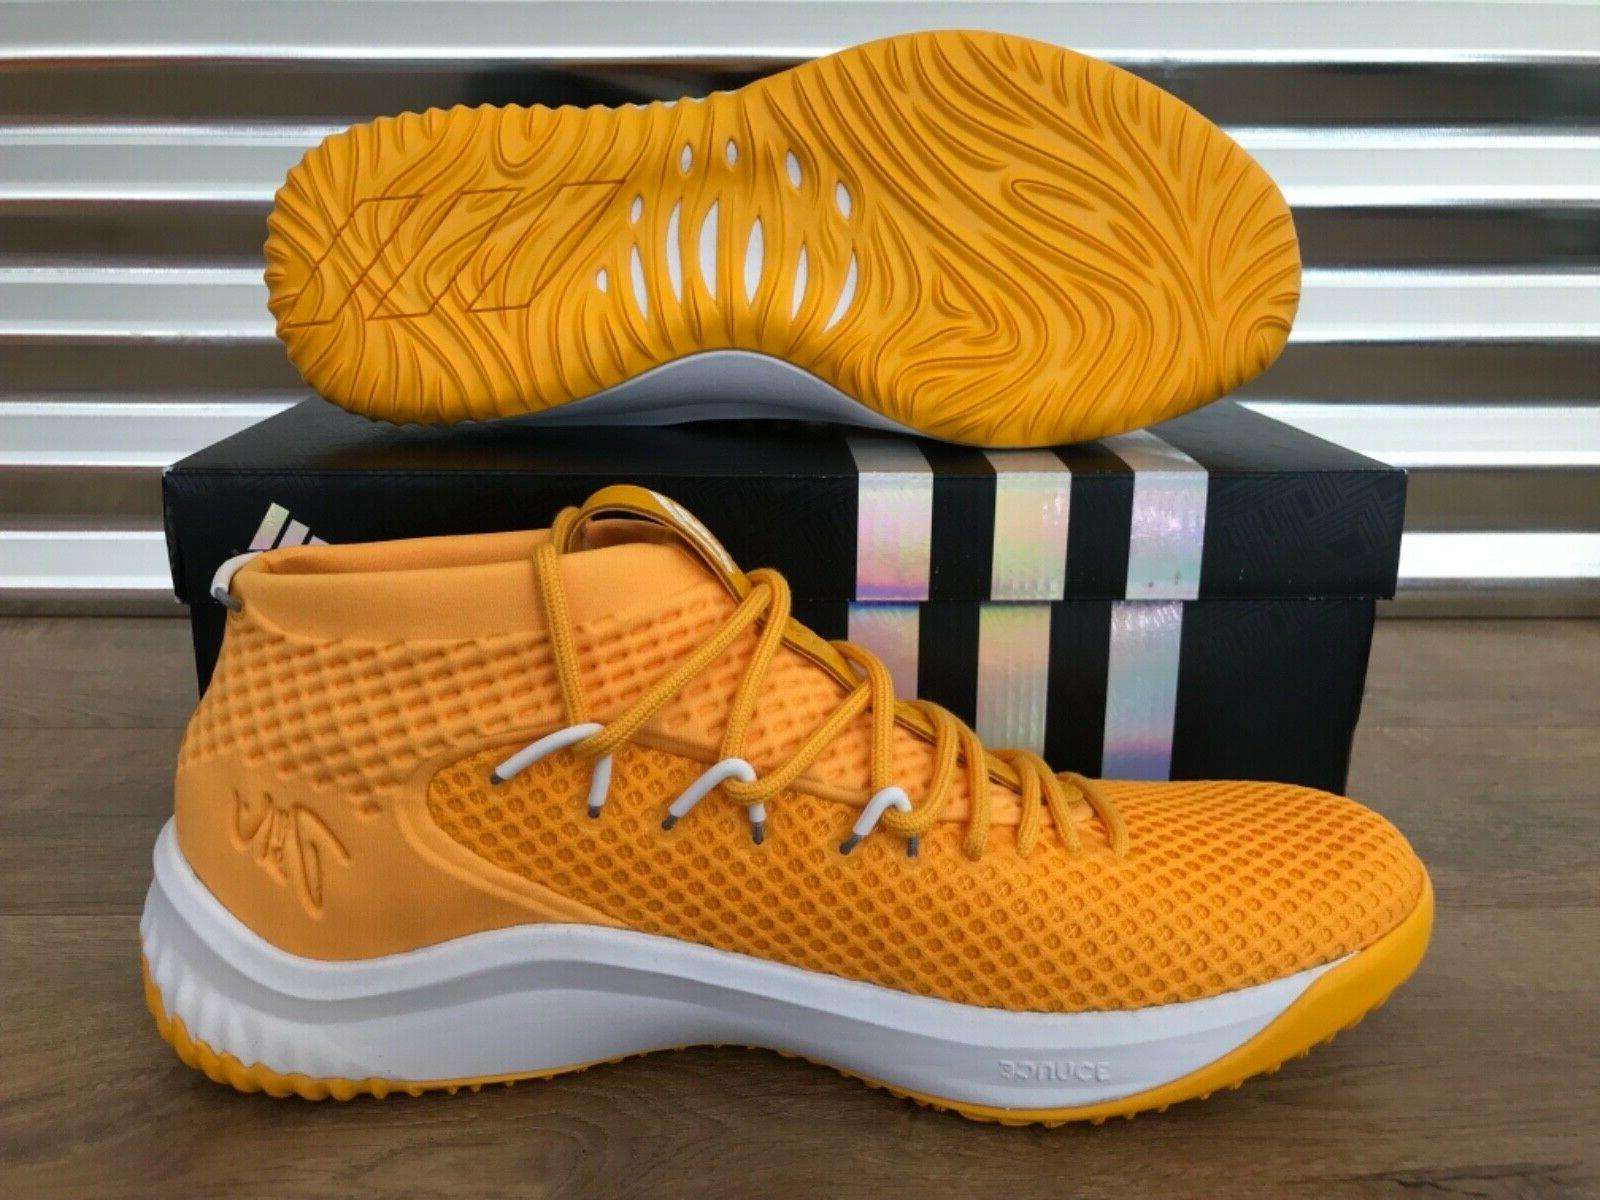 Adidas NBA Shoes Yellow Gold White Lilard NIB